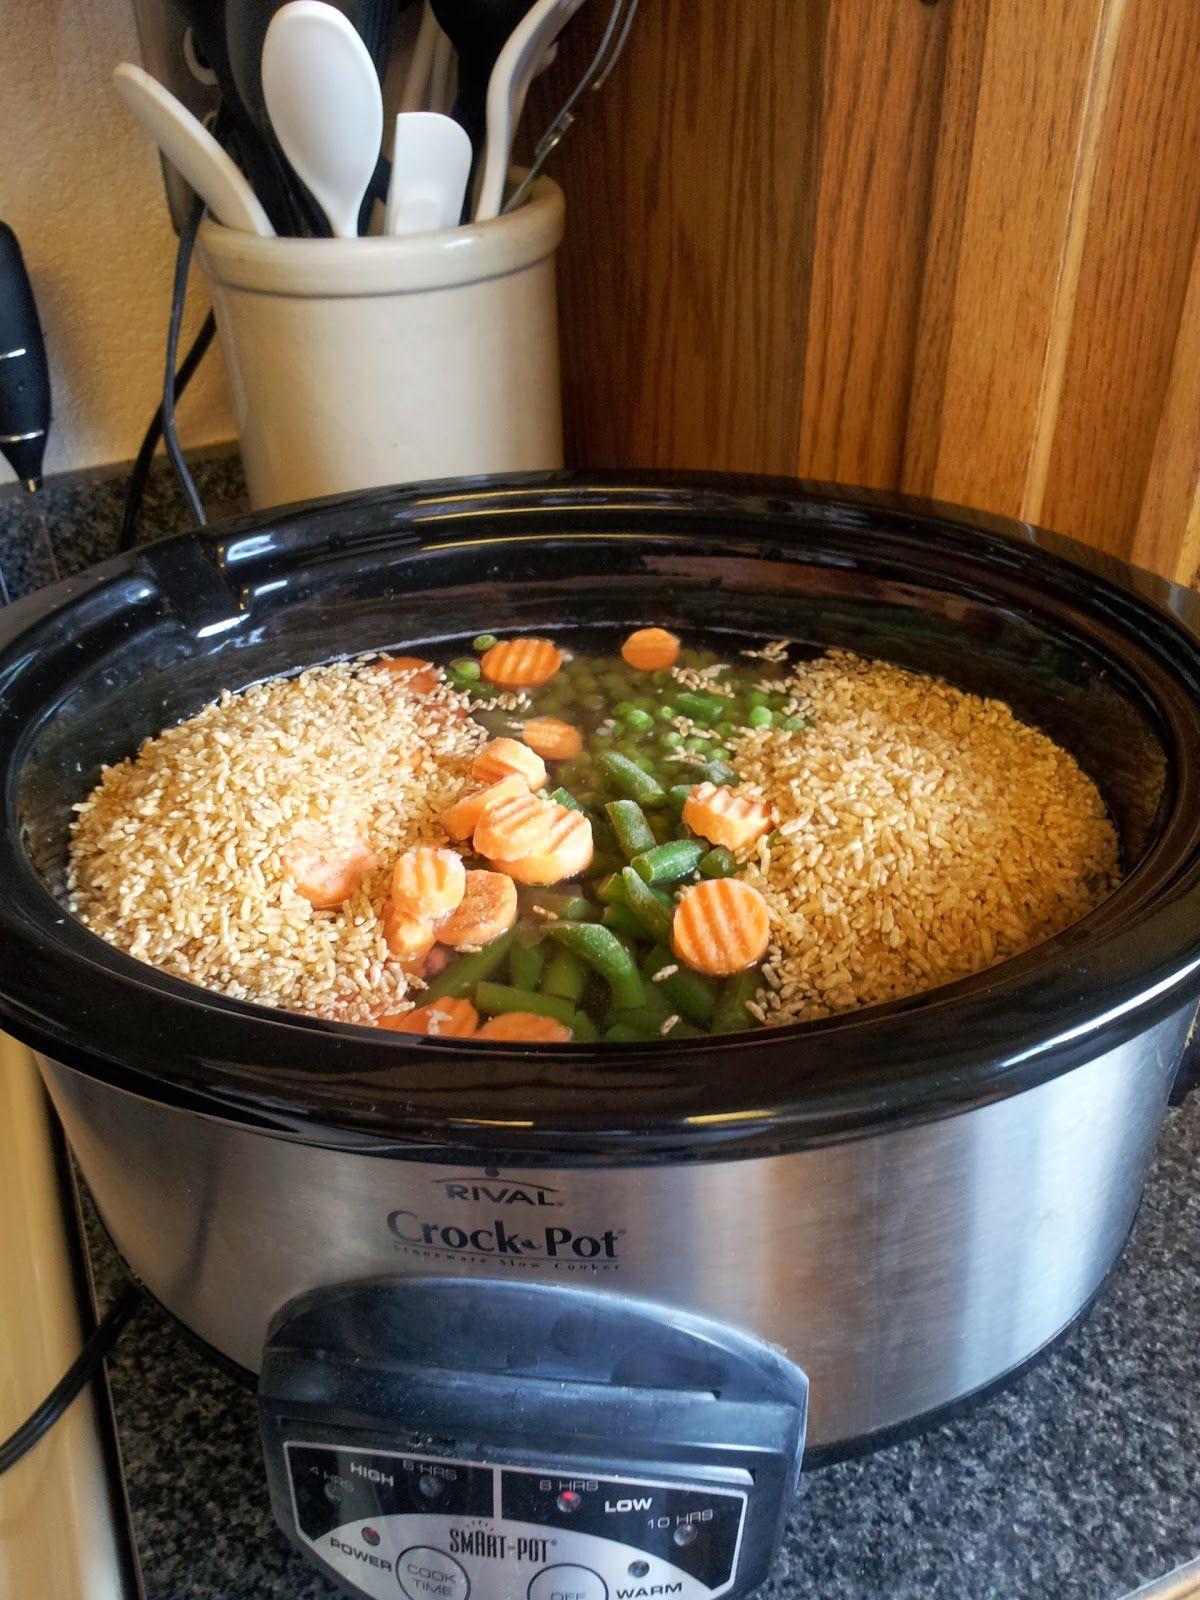 10 Slow Cooker And Crock Pot Dog Food Recipes | Dog food ...